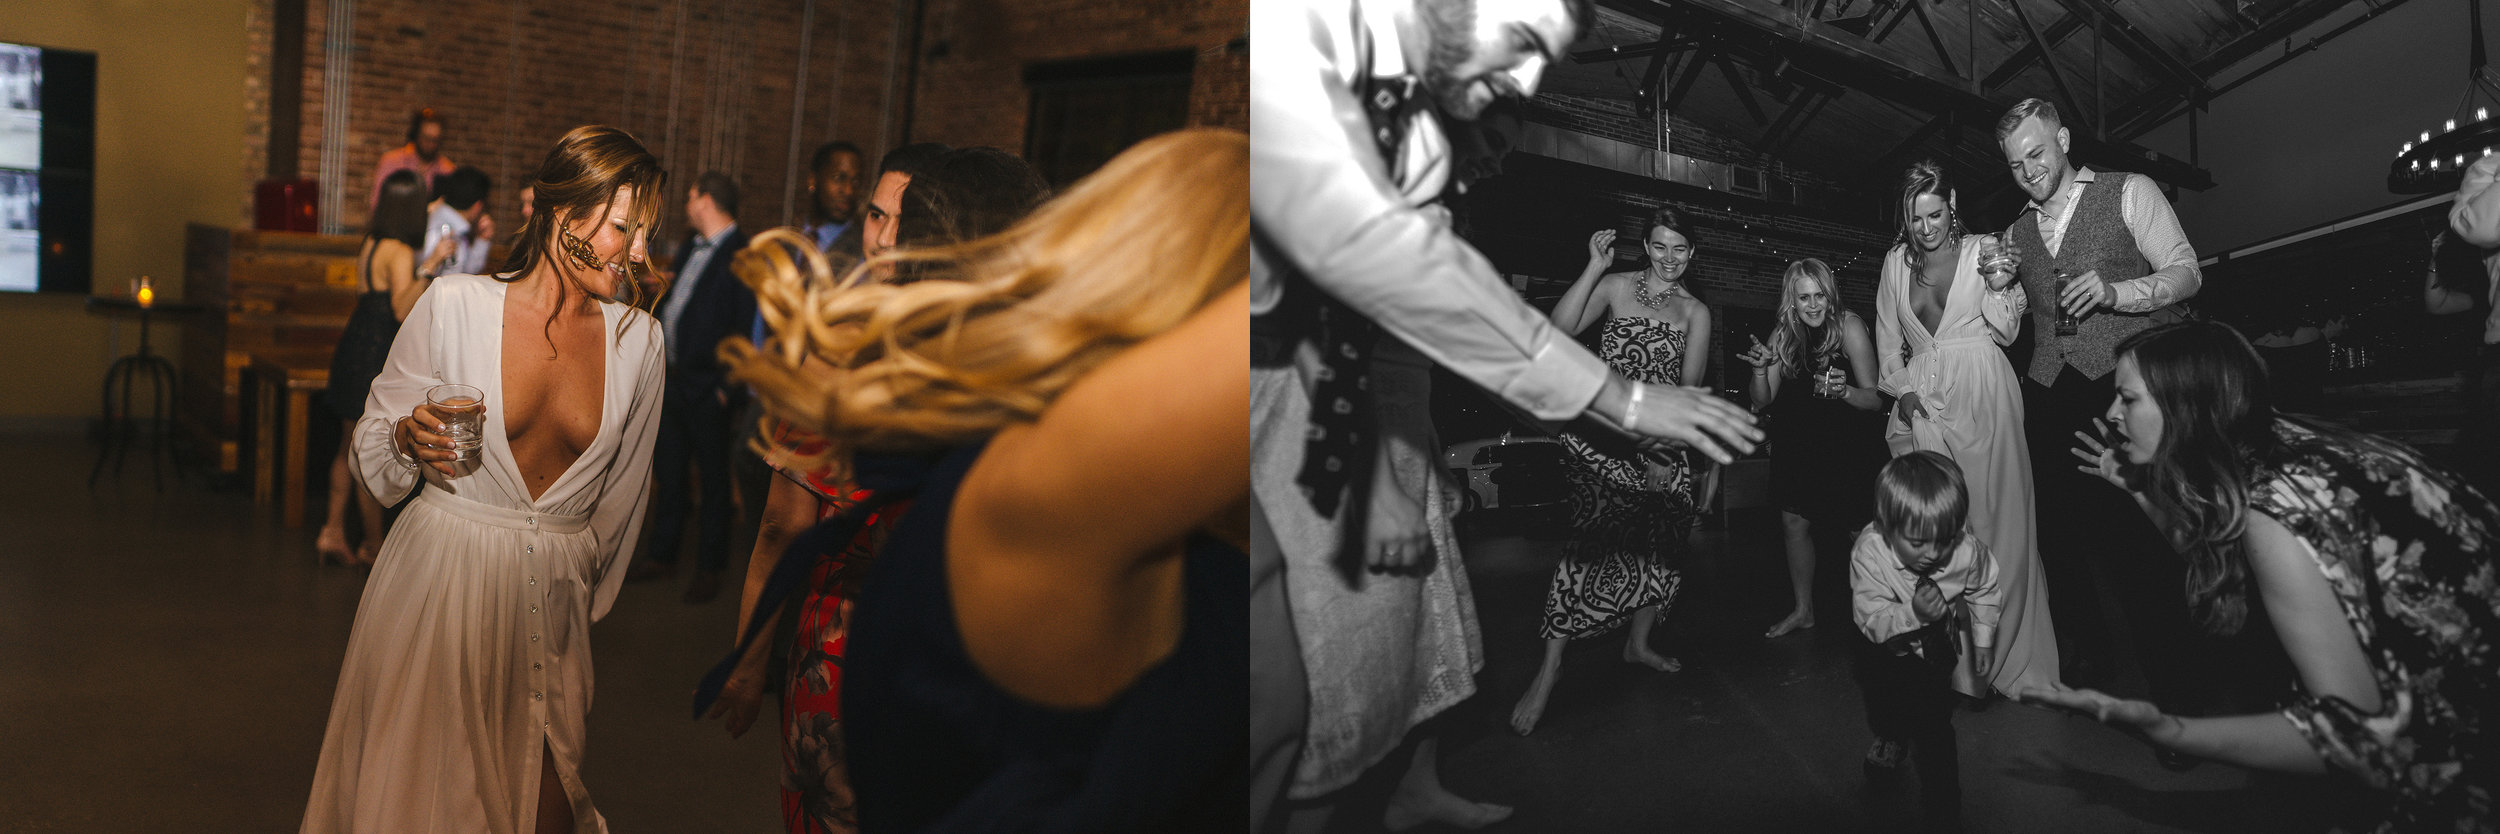 chicago_wedding_photography_zoe_rain_42.jpg